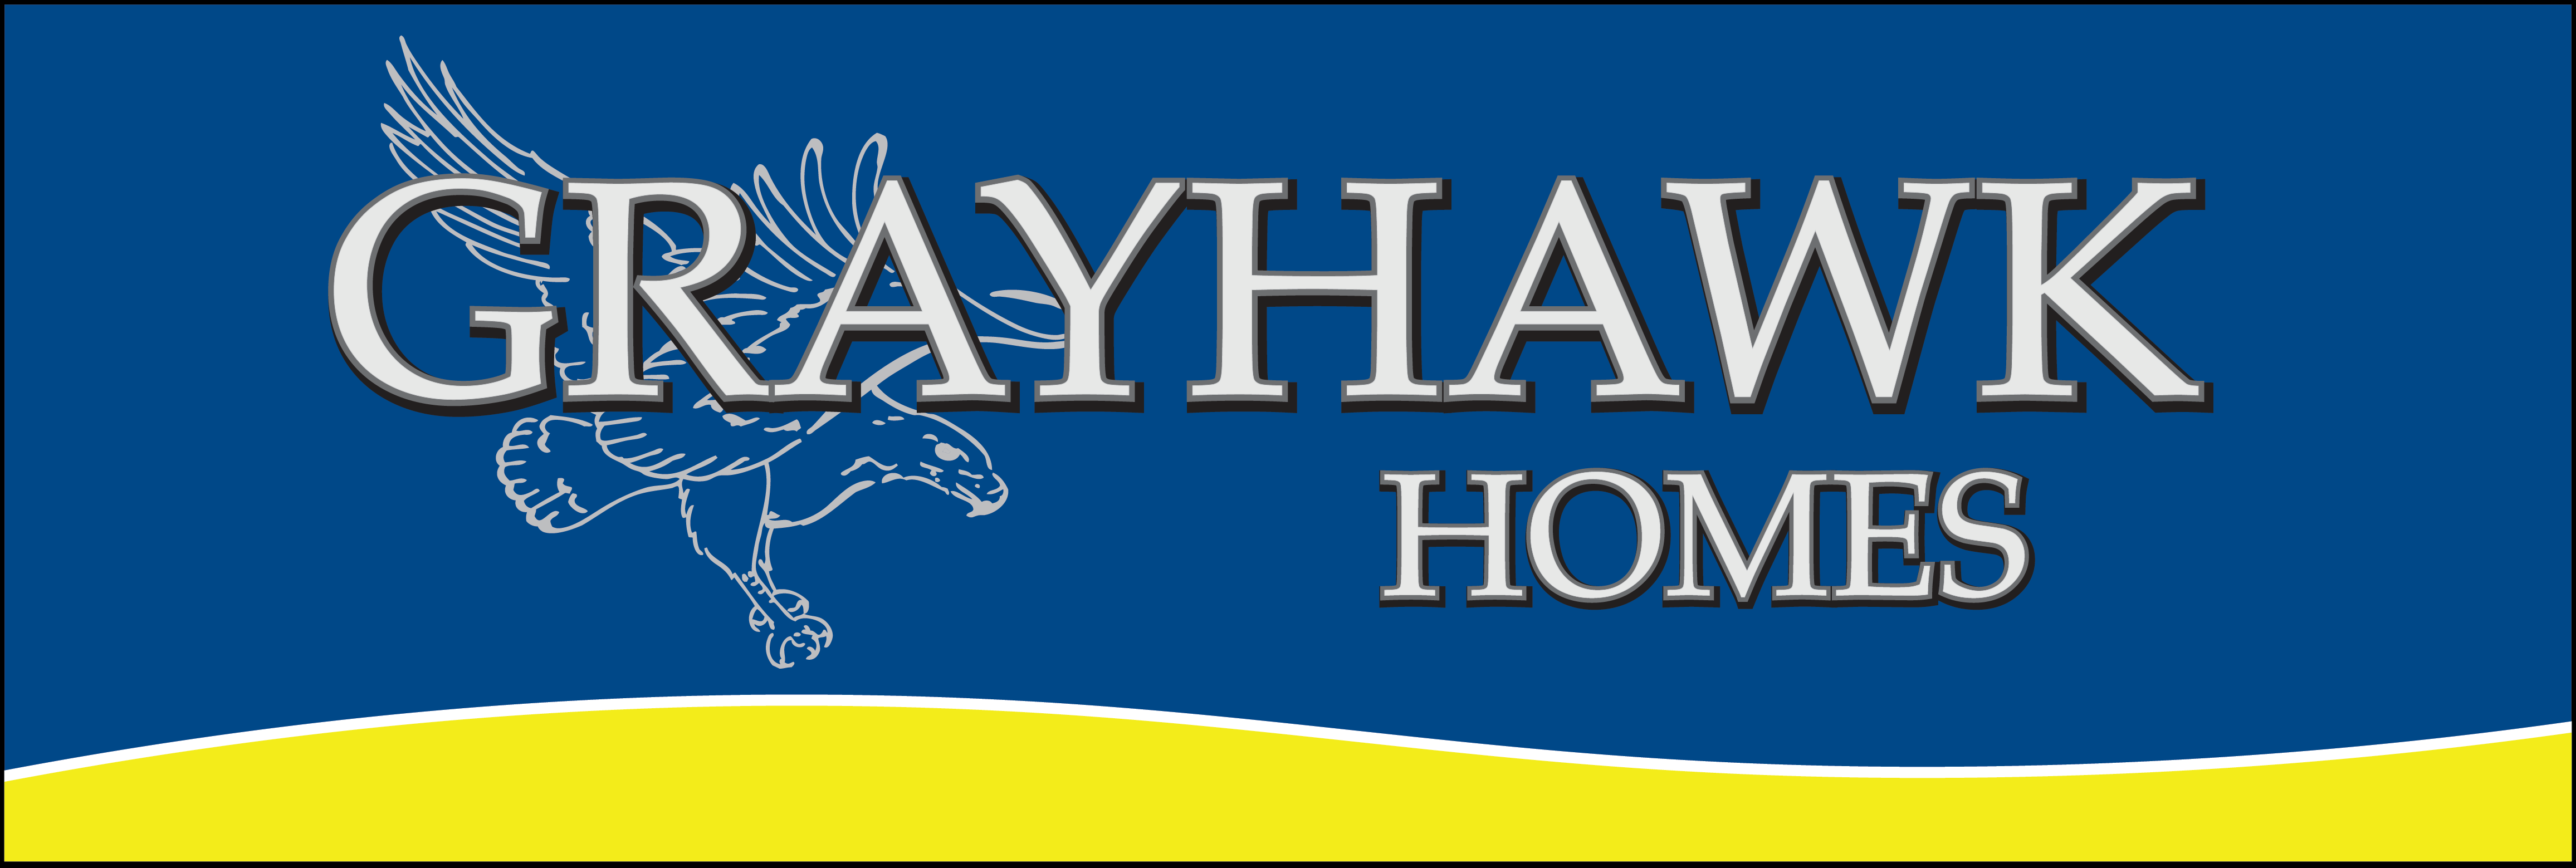 Grayhawk Homes reviews   Home Builder at 2301 Airport Thruway - Columbus GA